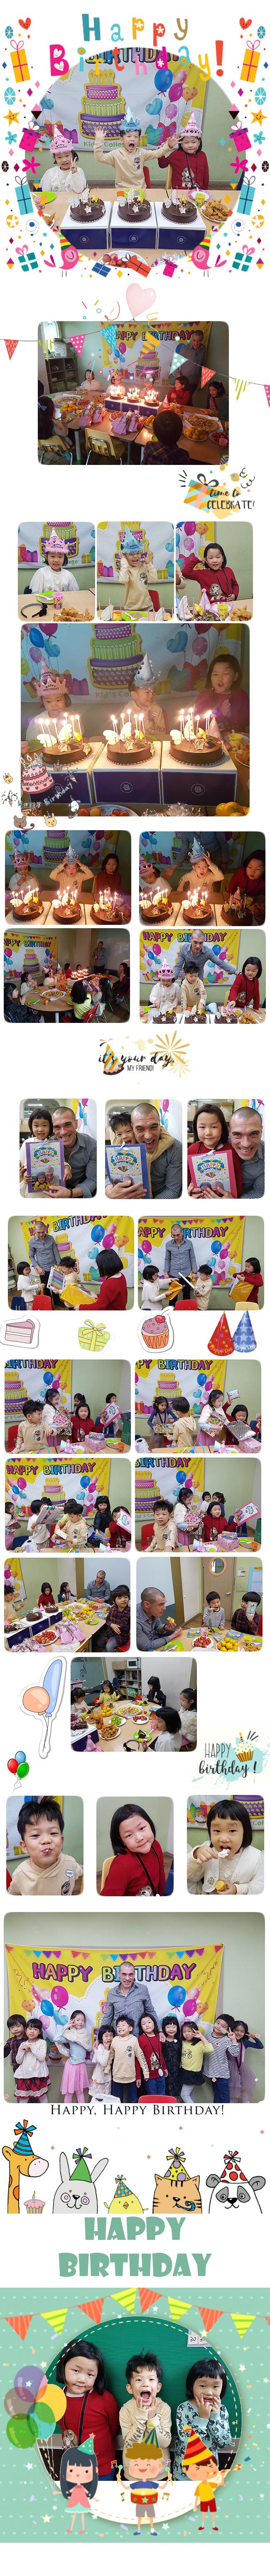 birthday_pine.jpg